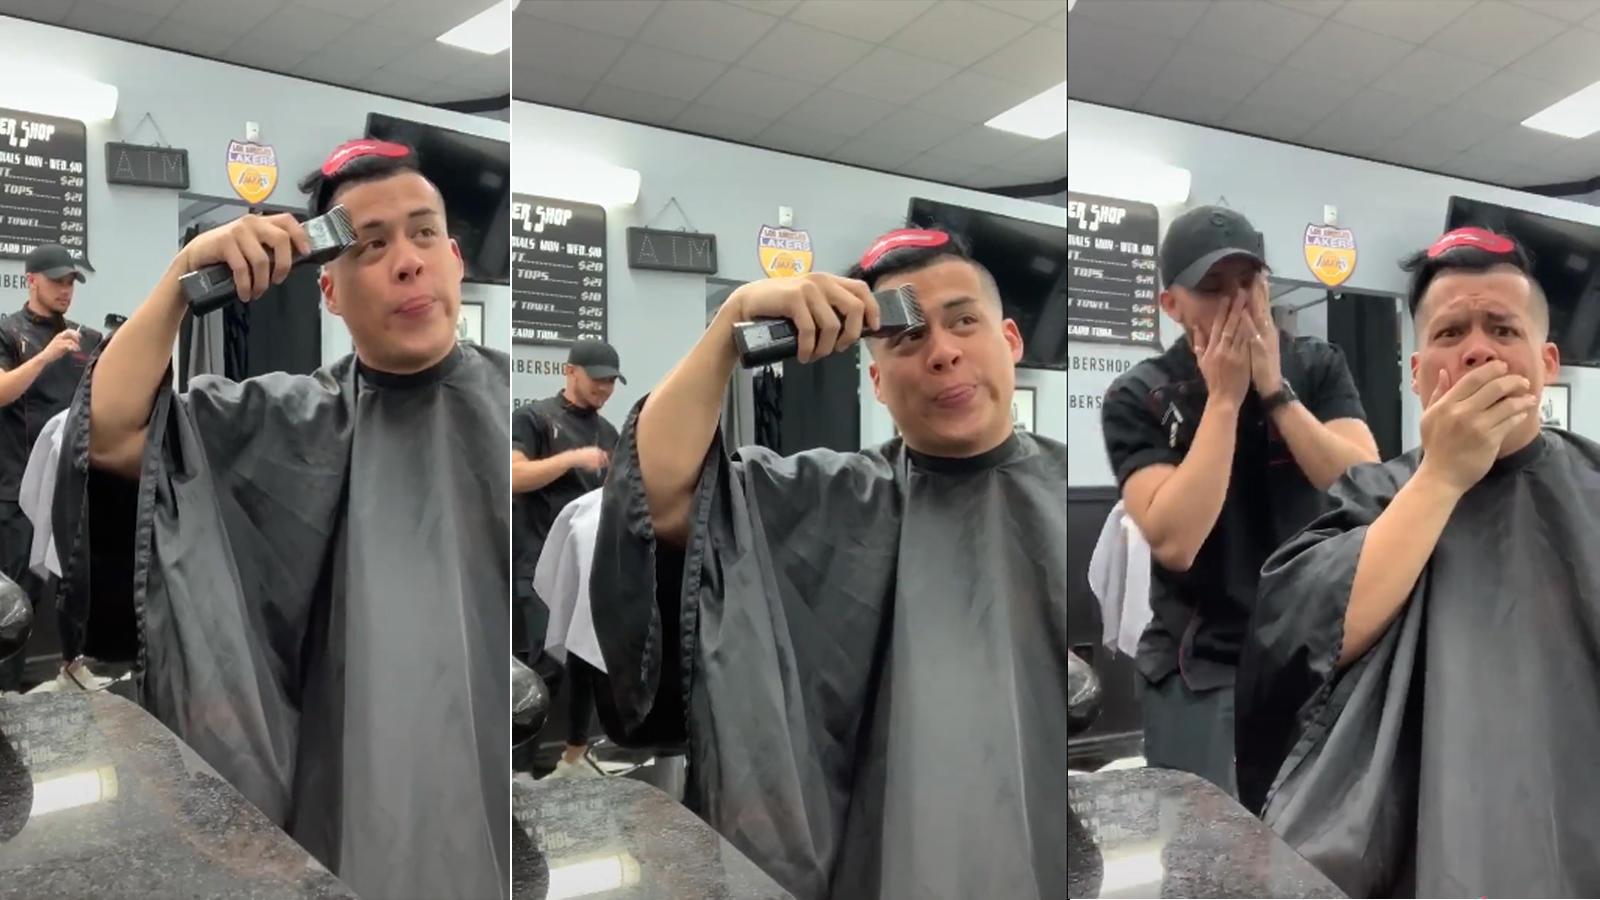 viral-video-eyebrow-shaving-prank-goes-wrong